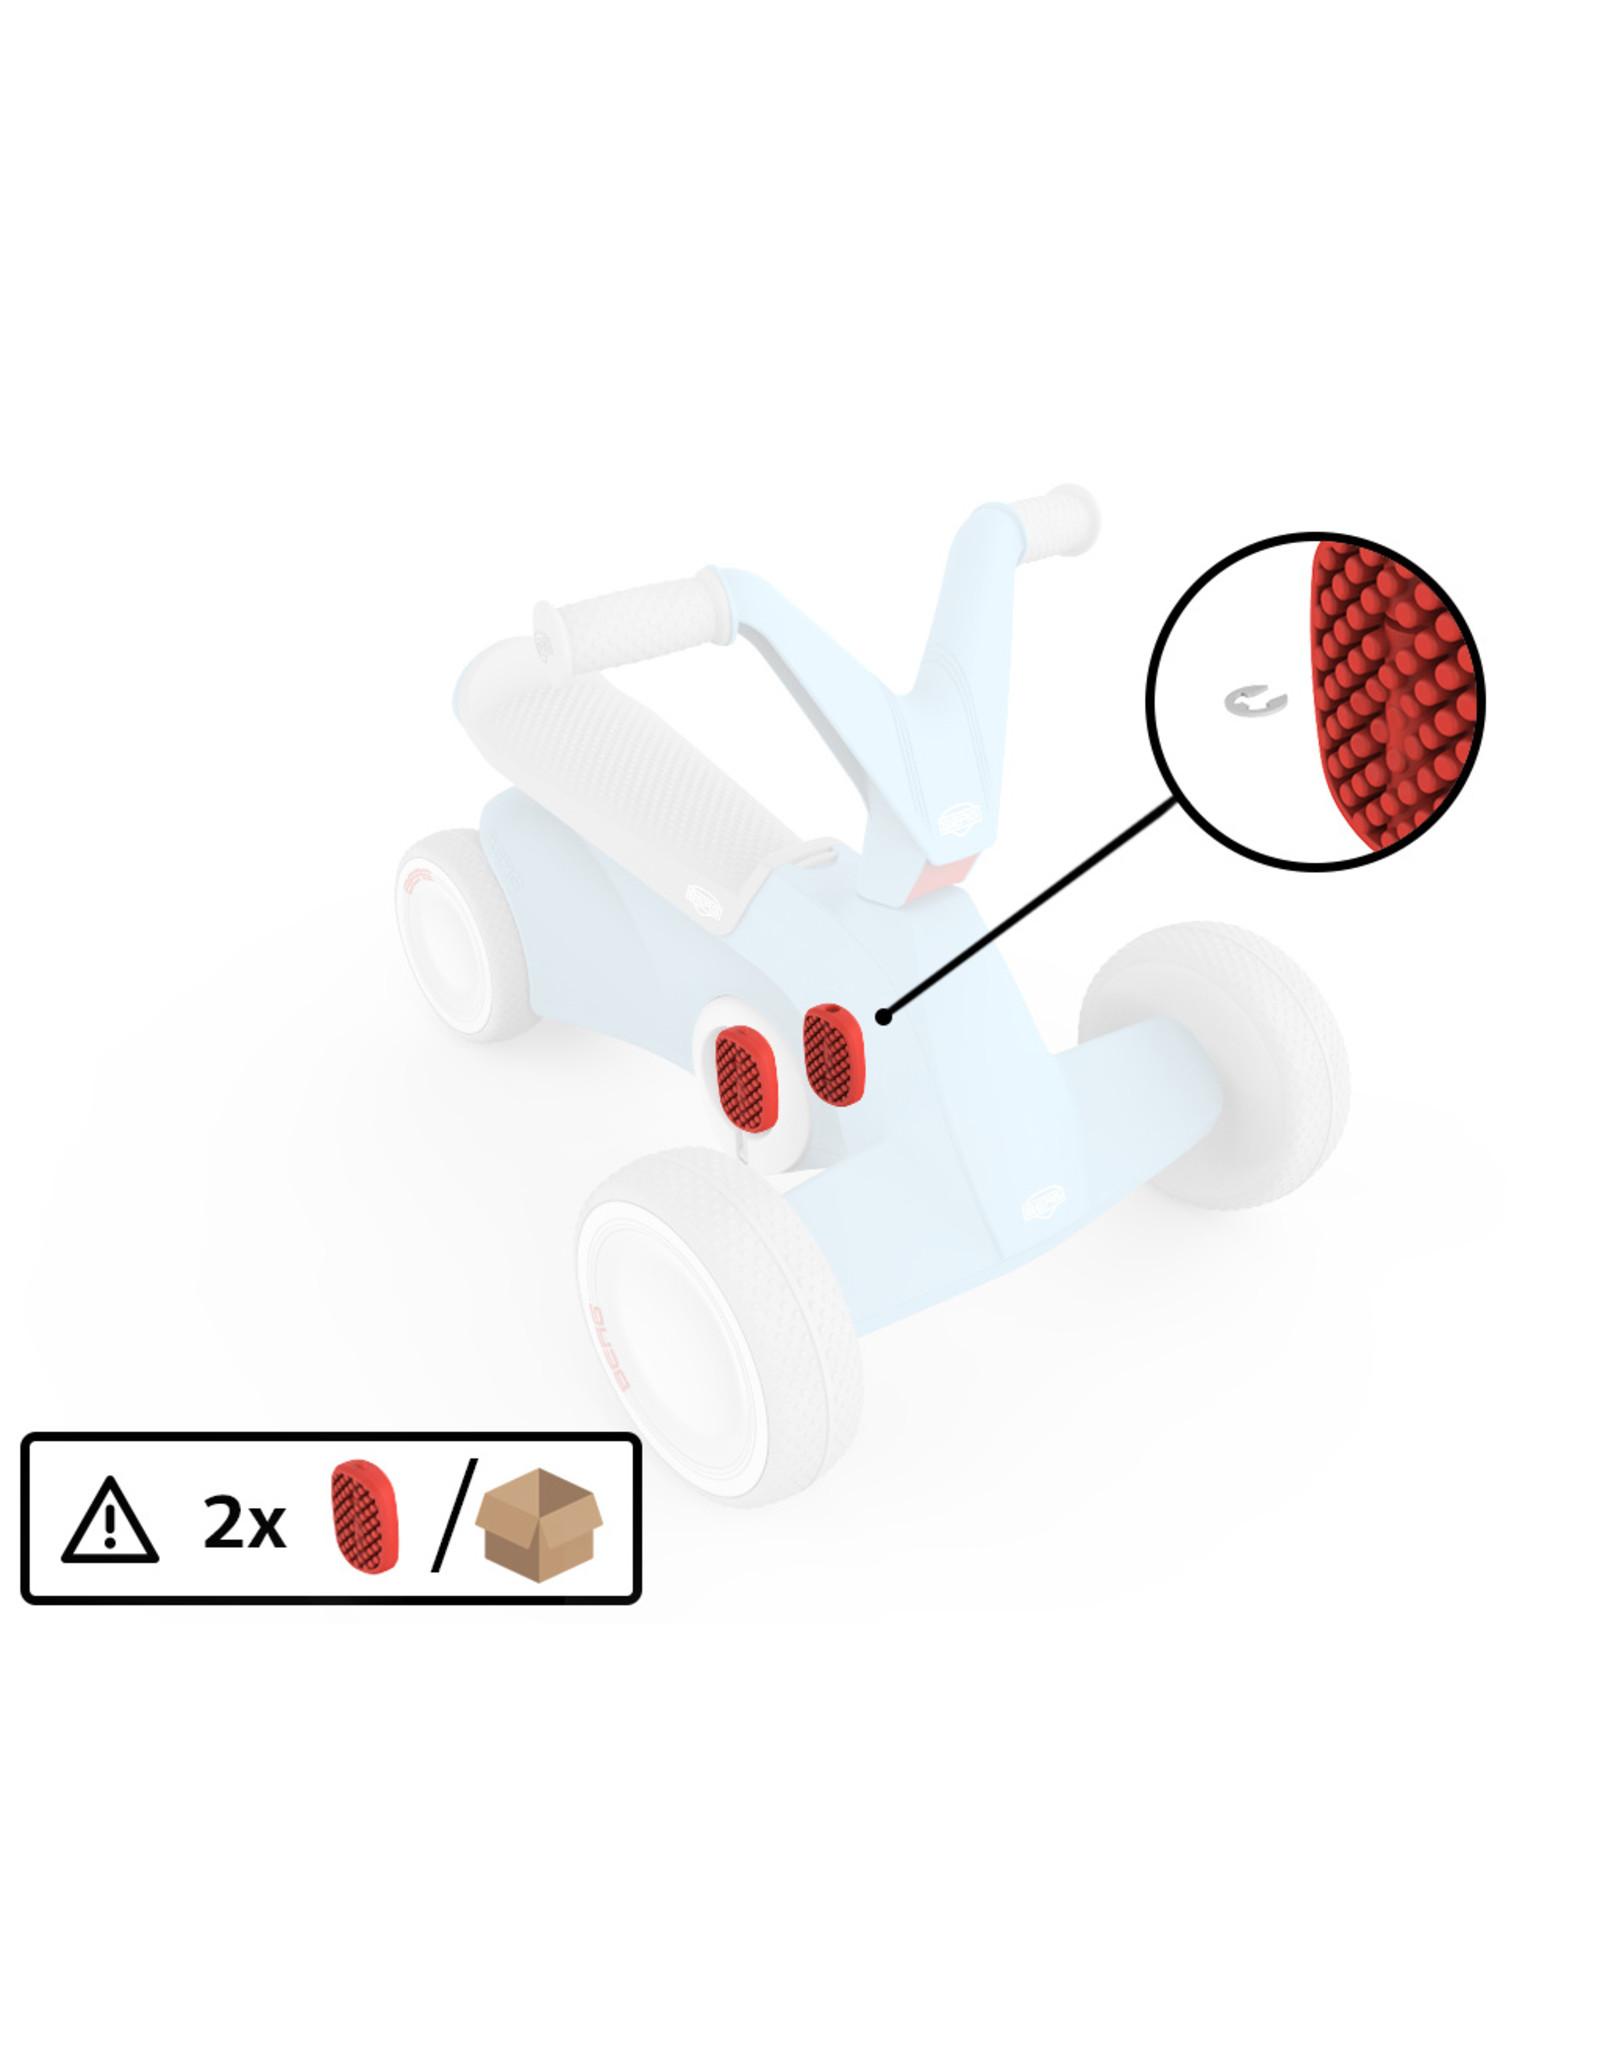 BERG BERG Go2 - Pedal (2x)